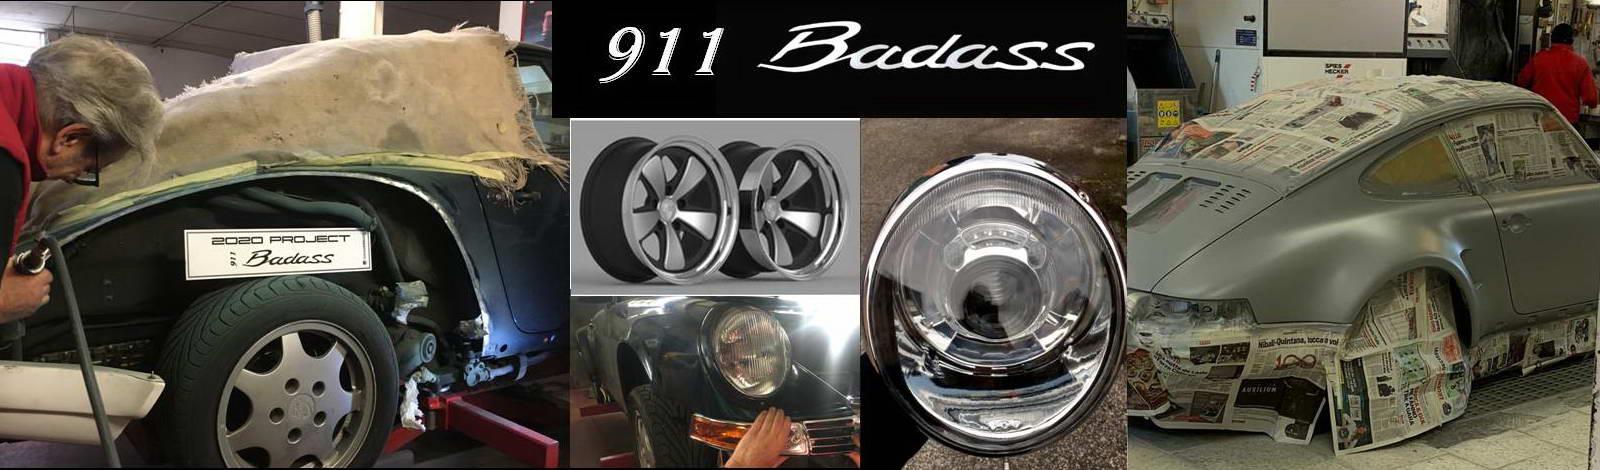 banner porsche 911 Badass 2